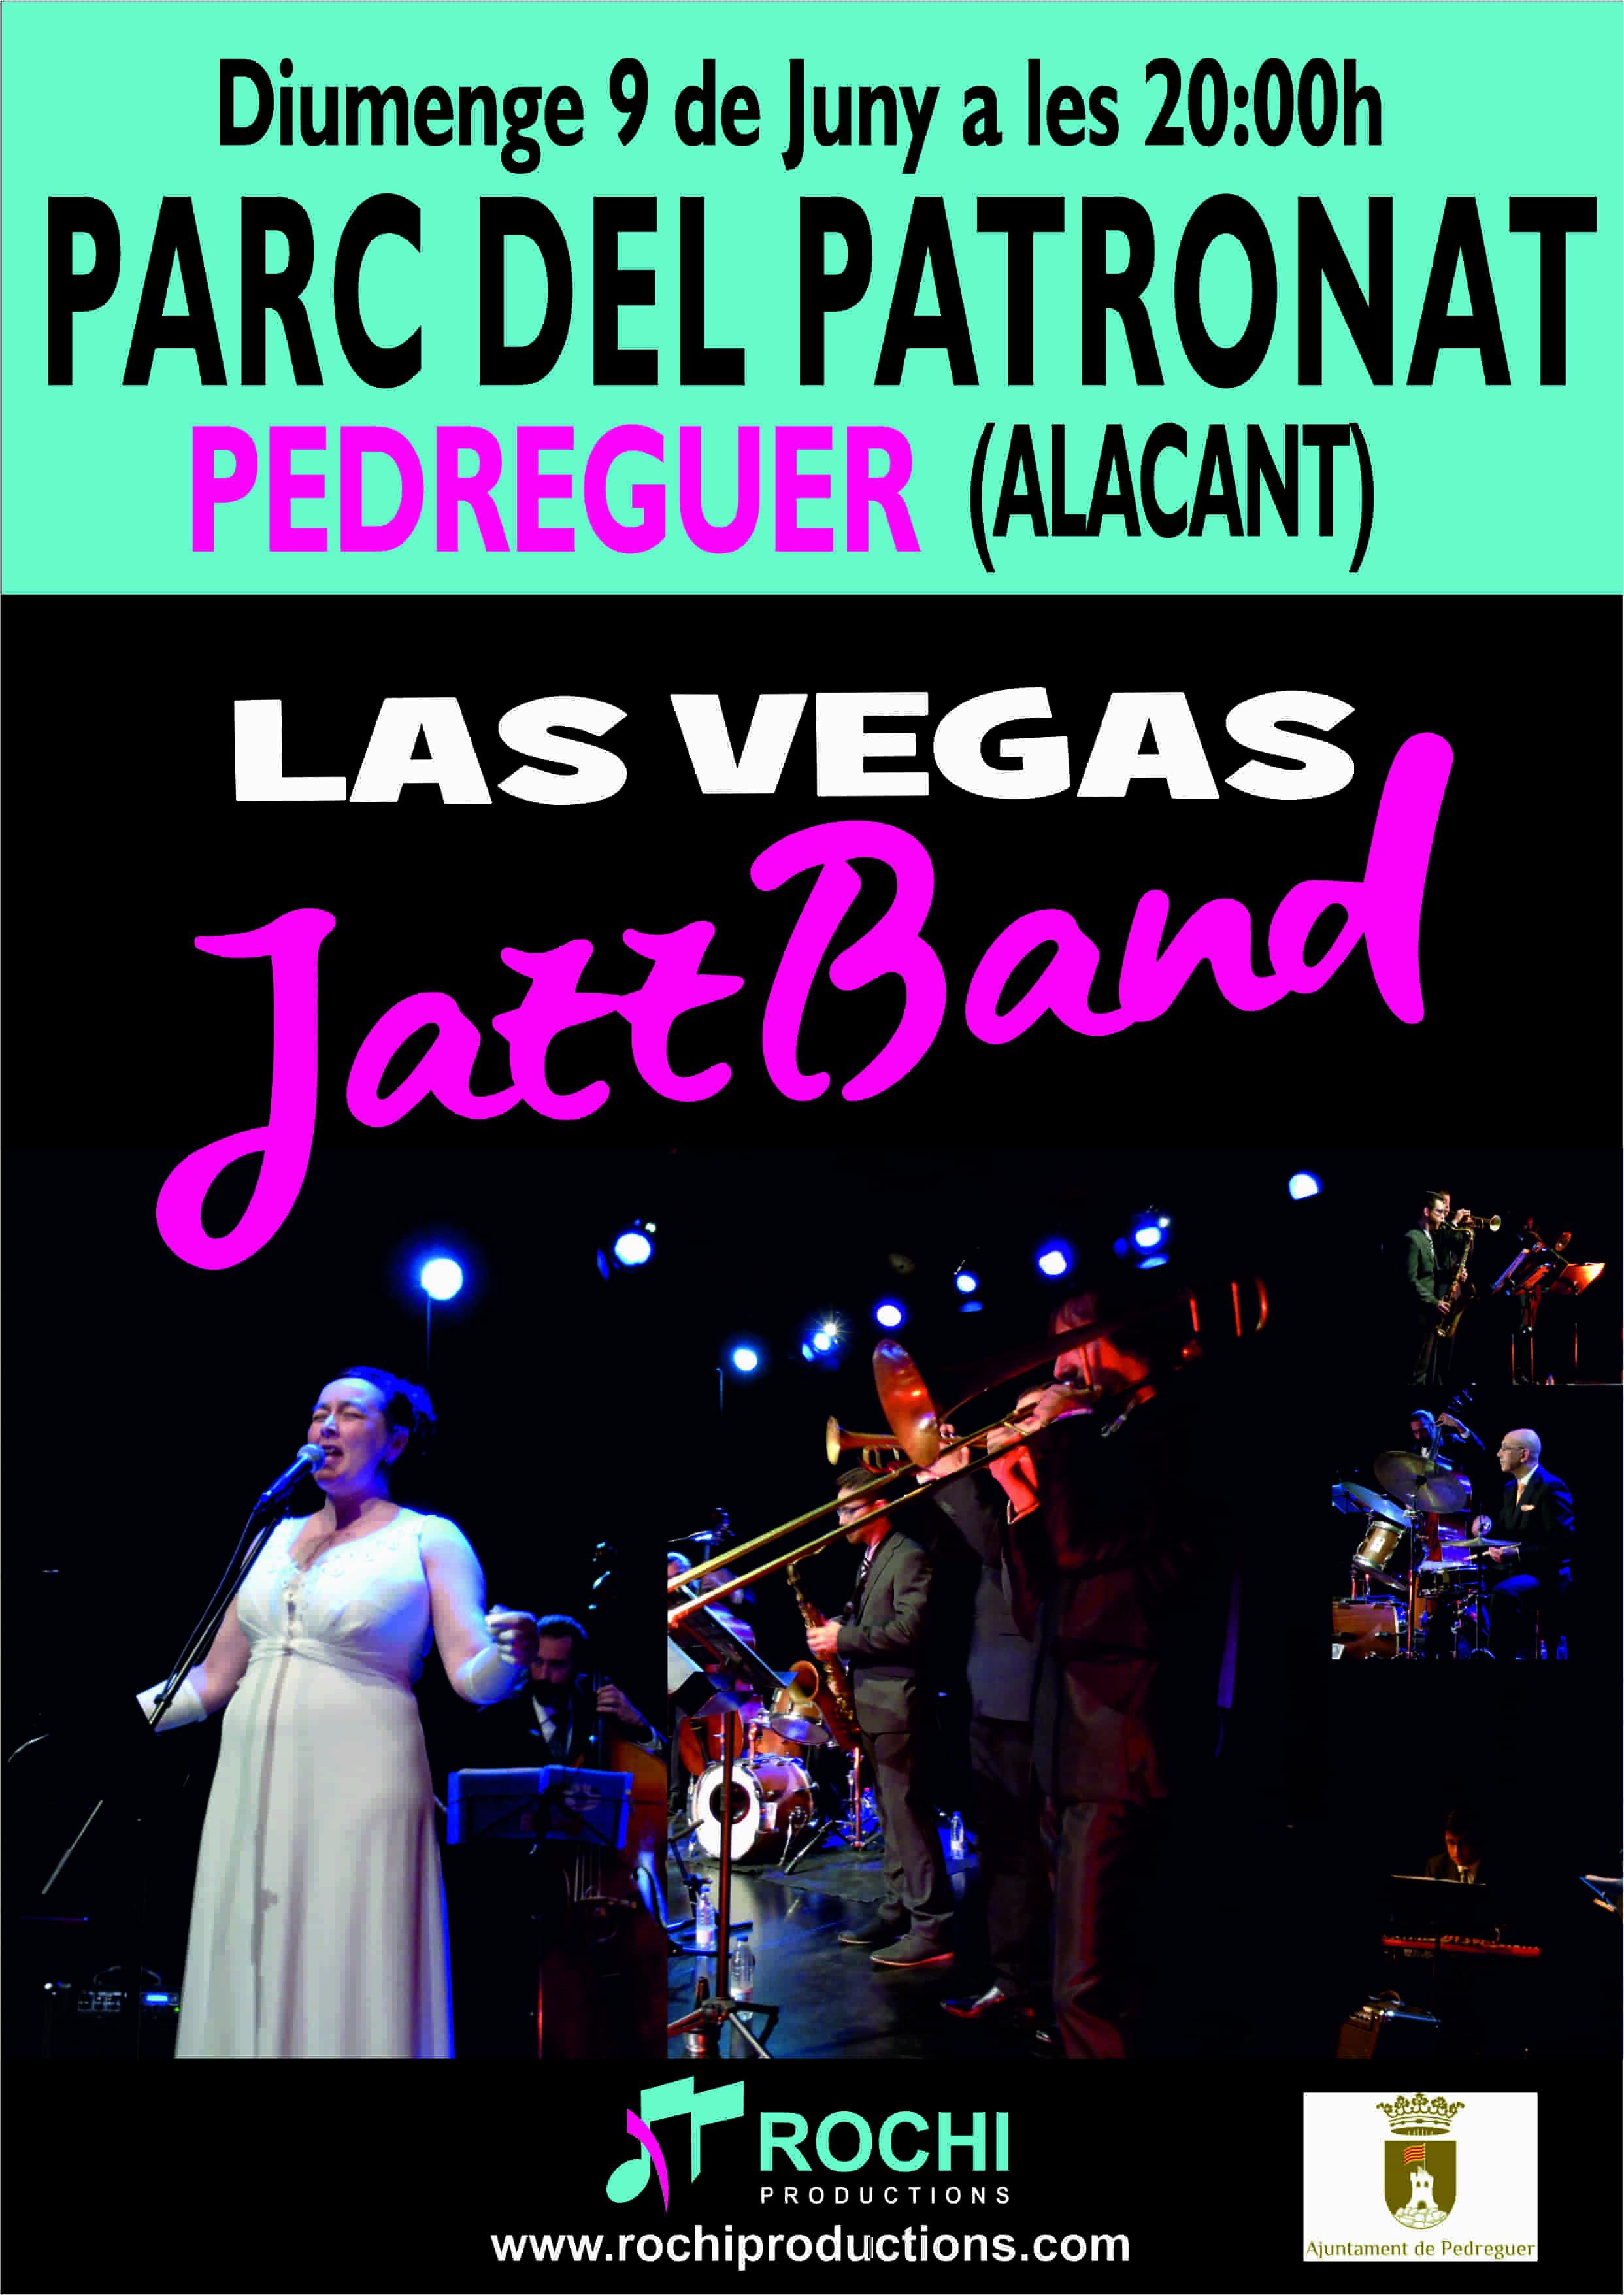 Las Vegas Jazz Band en Pedreguer